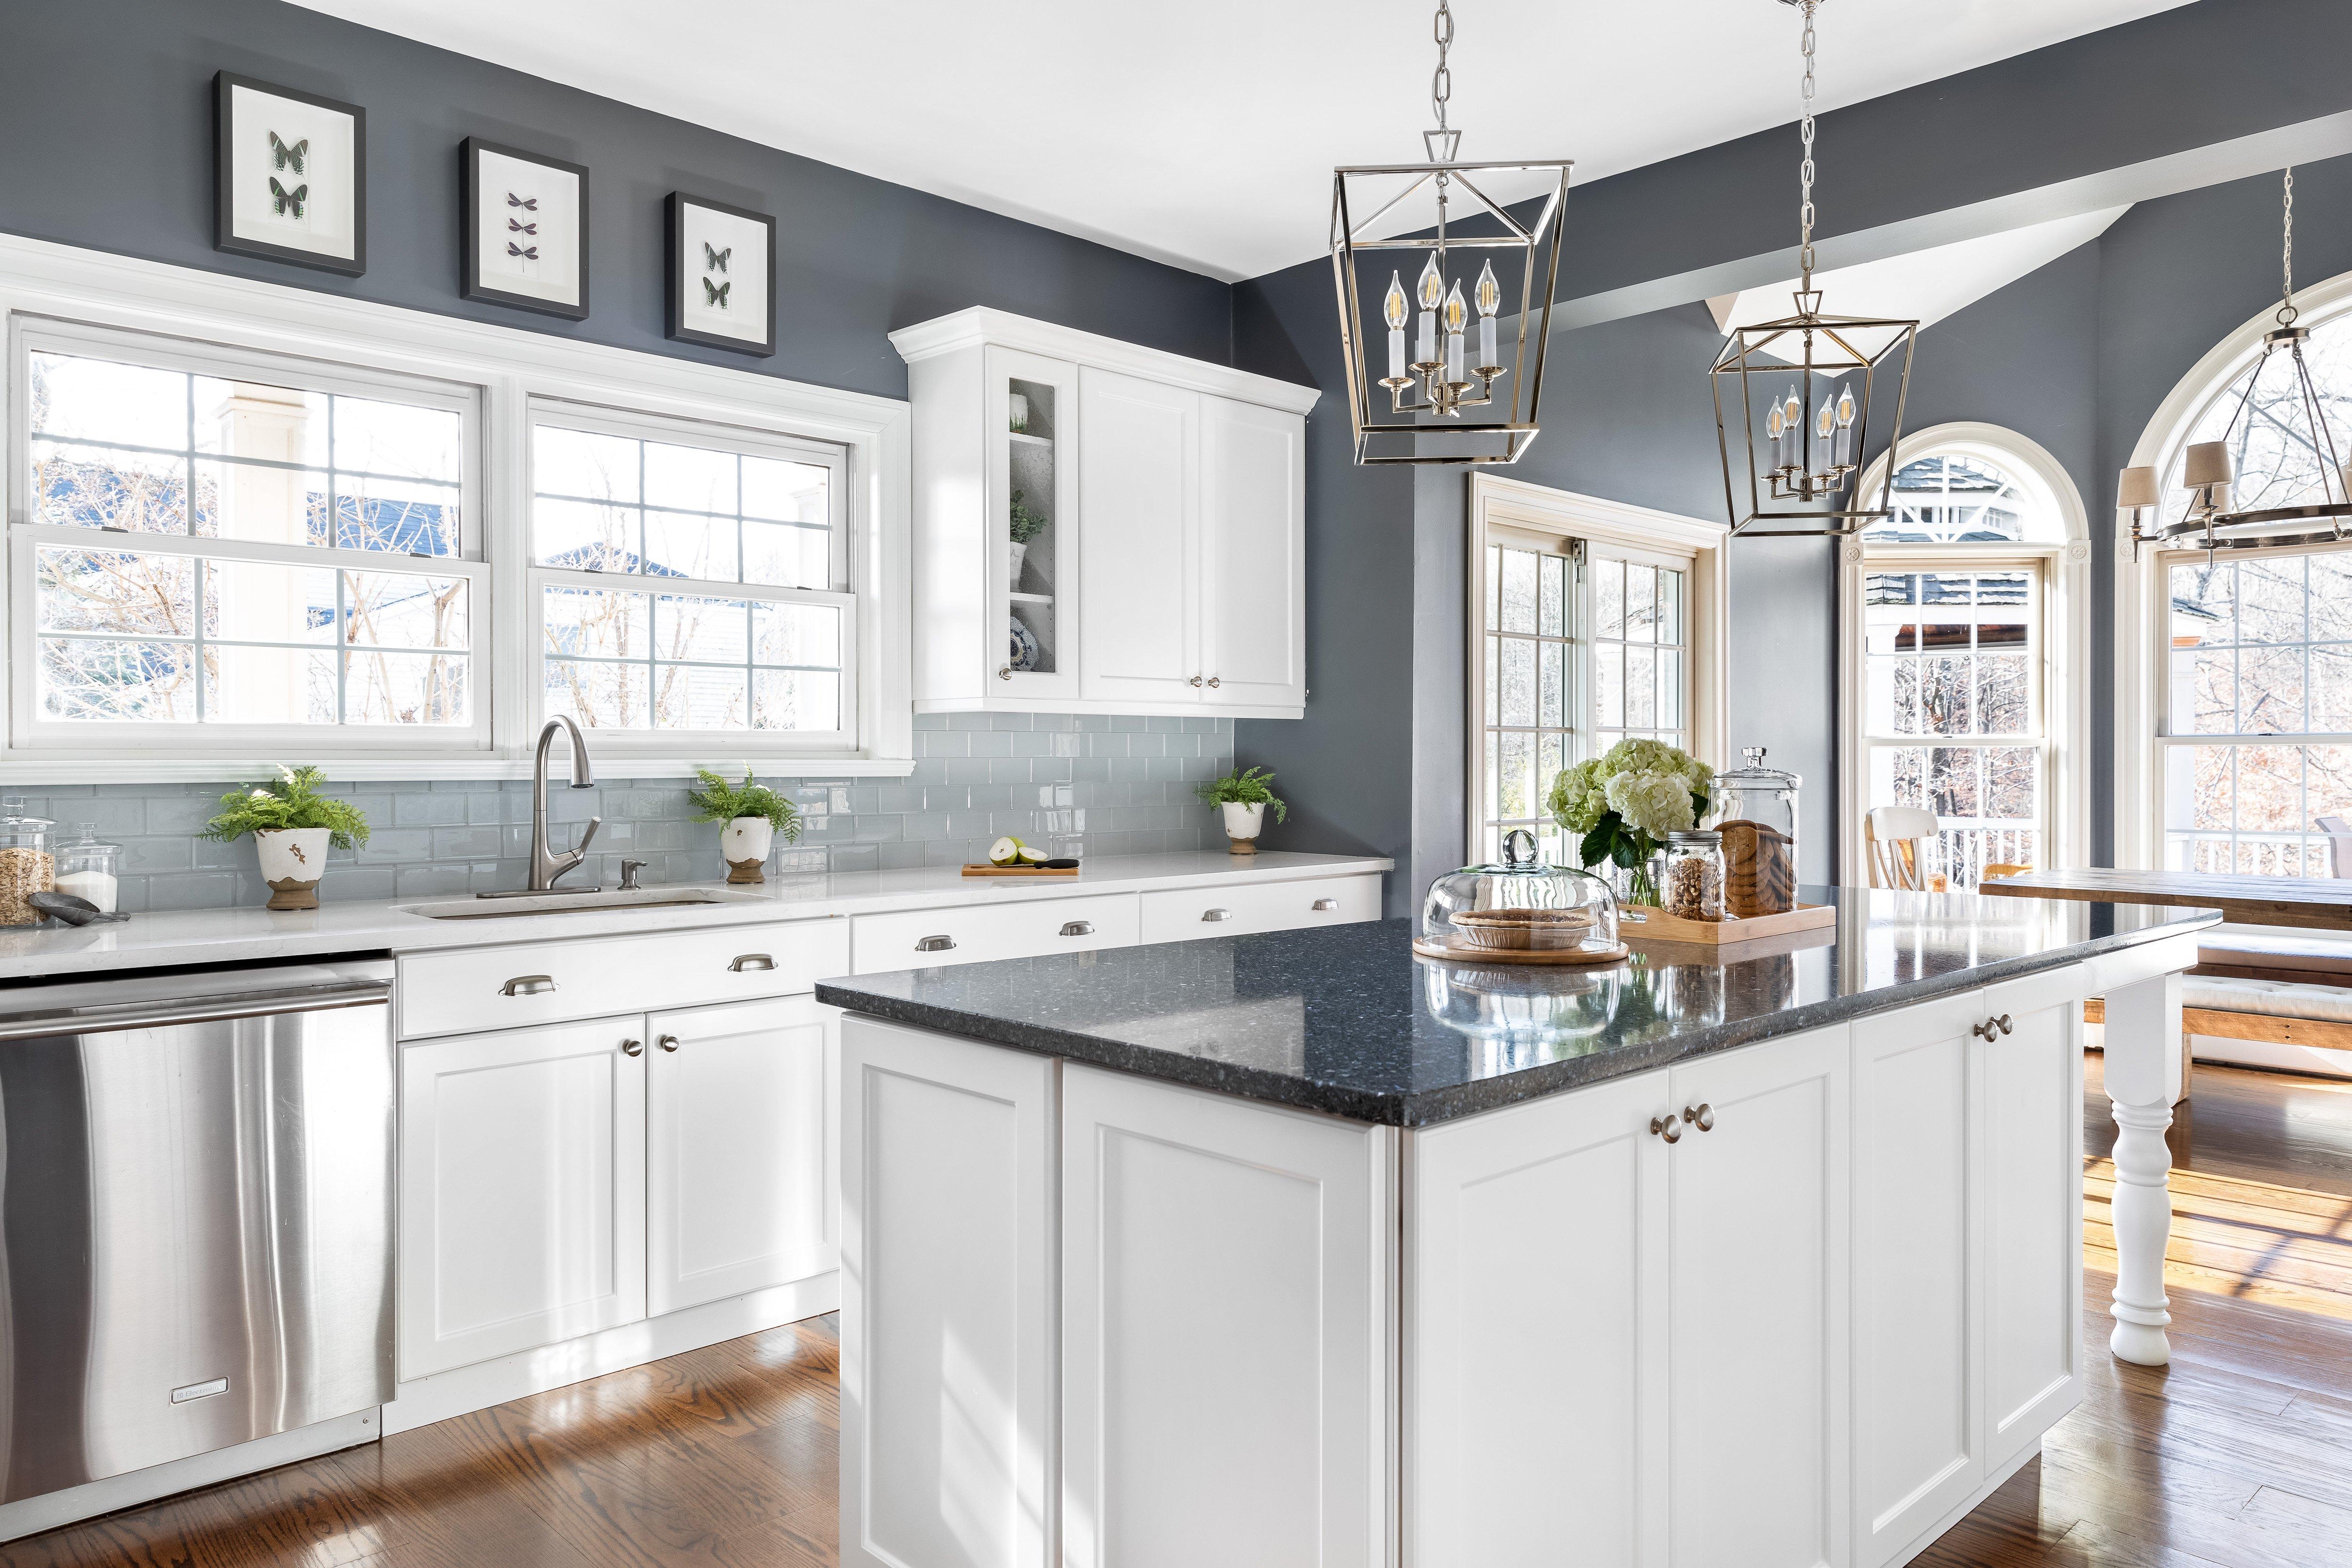 Stylish Coordinated Kitchen